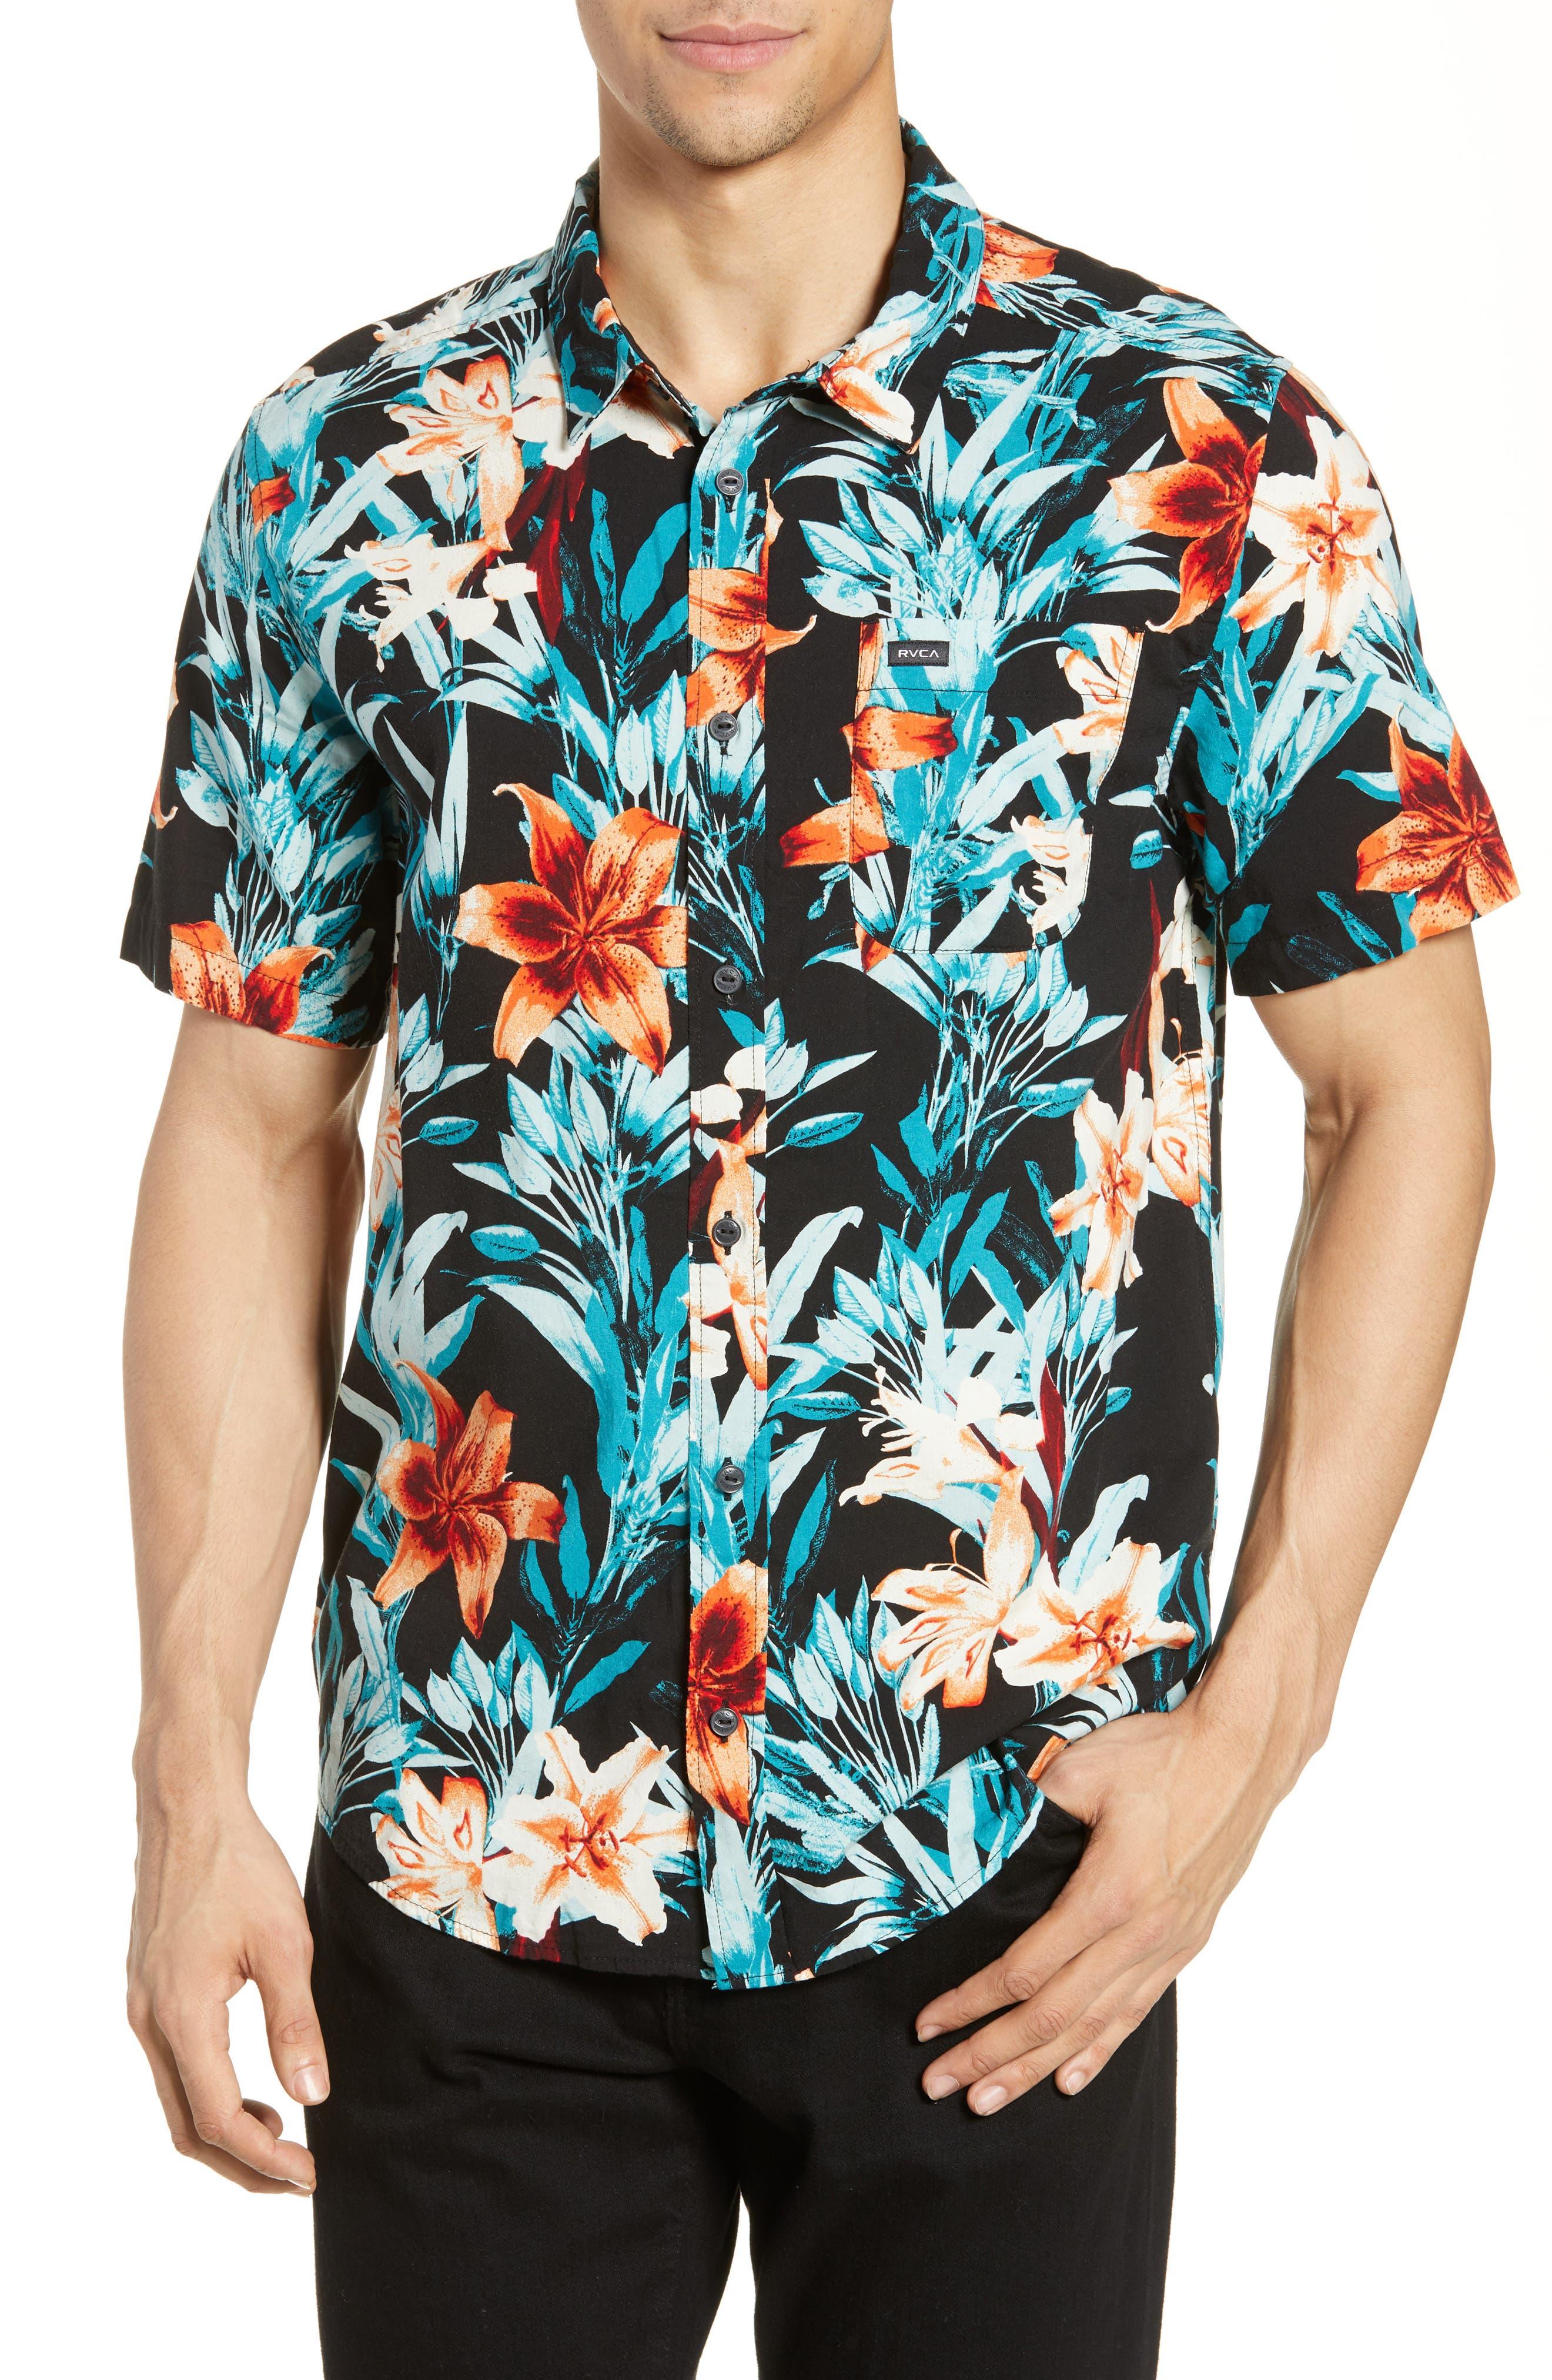 RVCA, Montague Floral Woven Shirt, Main thumbnail 1, color, 001